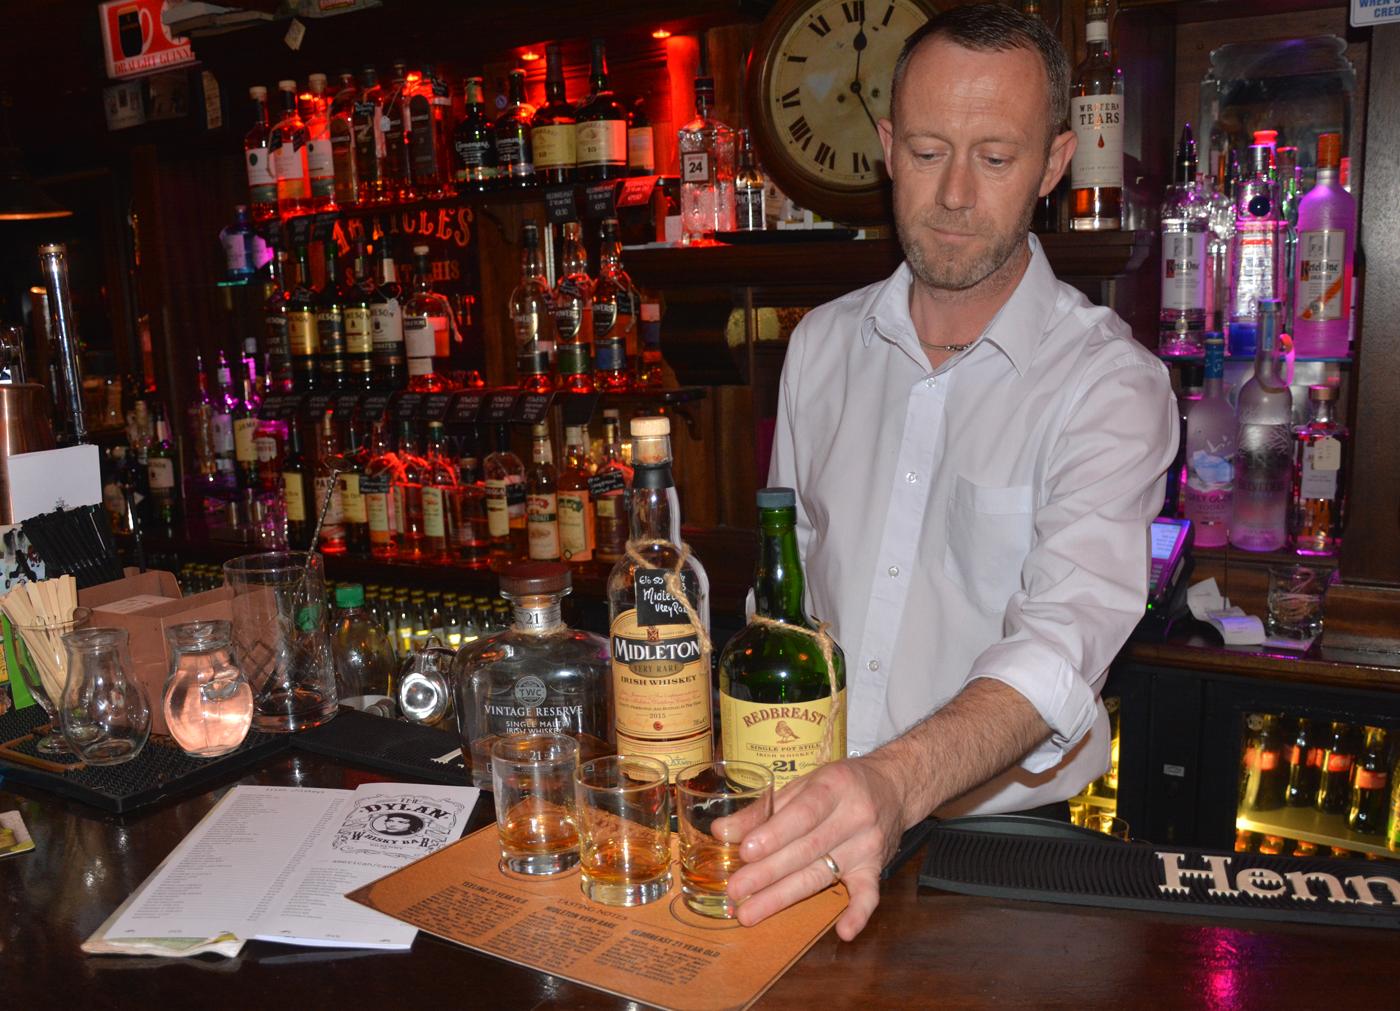 A flight of top shelf whiskey